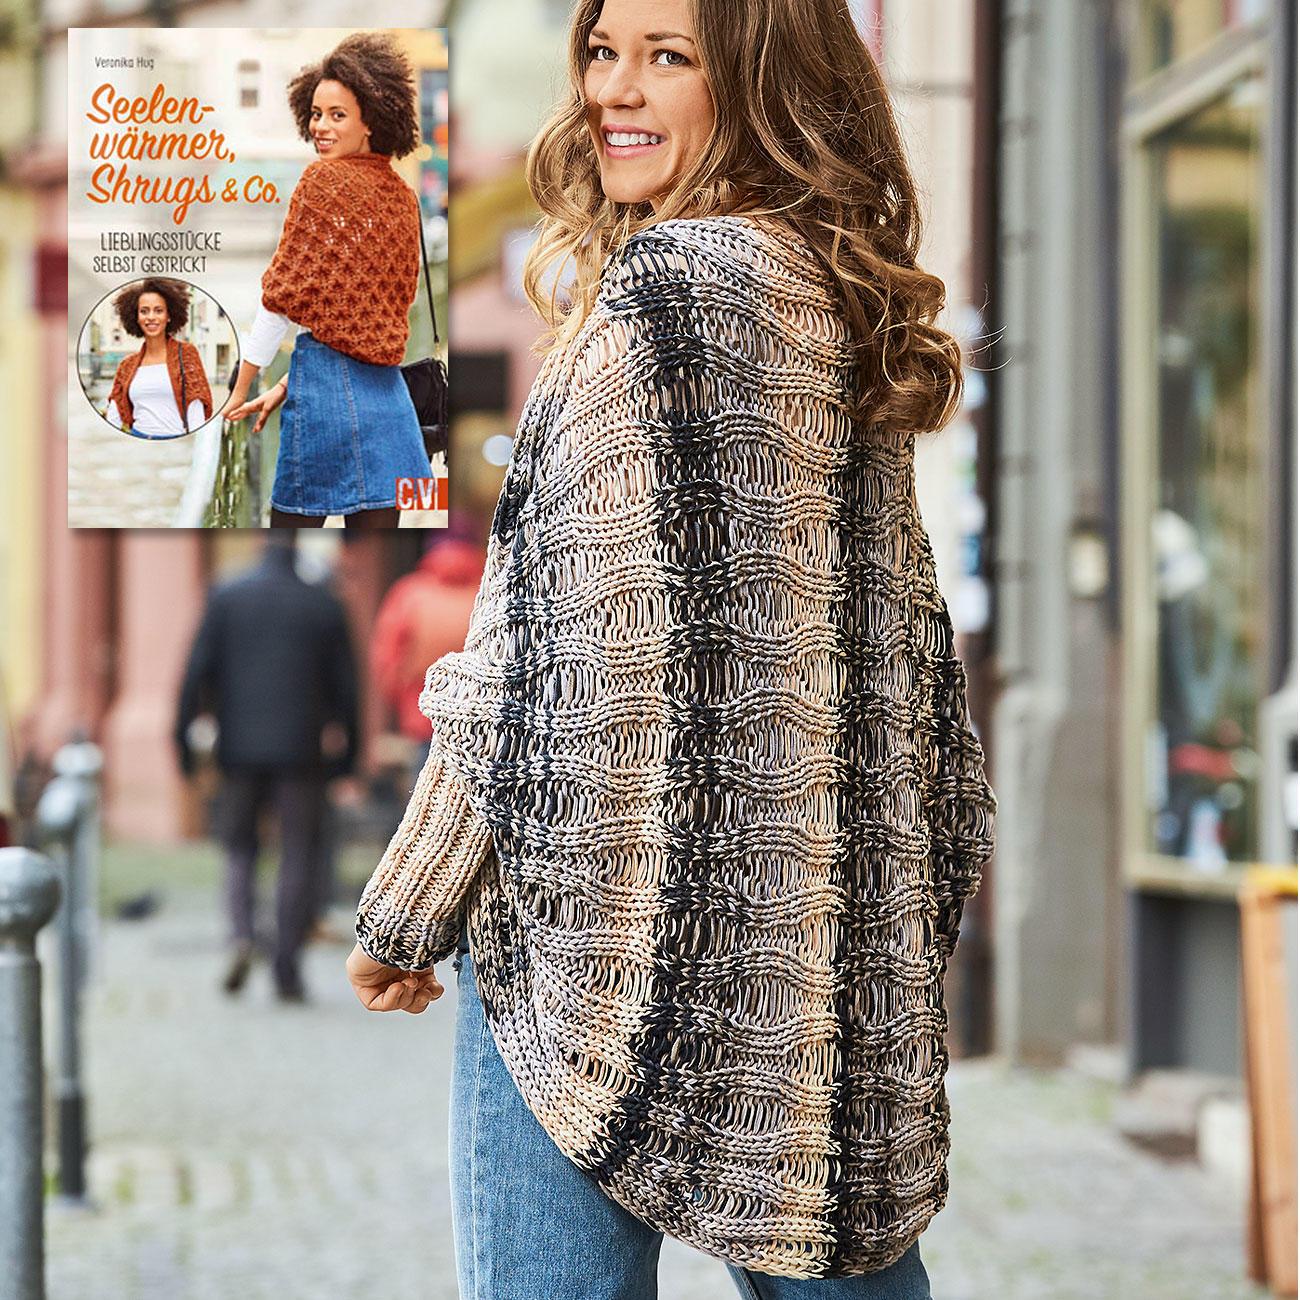 Anleitung 3717 Damen Jacke Aus Bandy Color Von Woolly Hugs 1